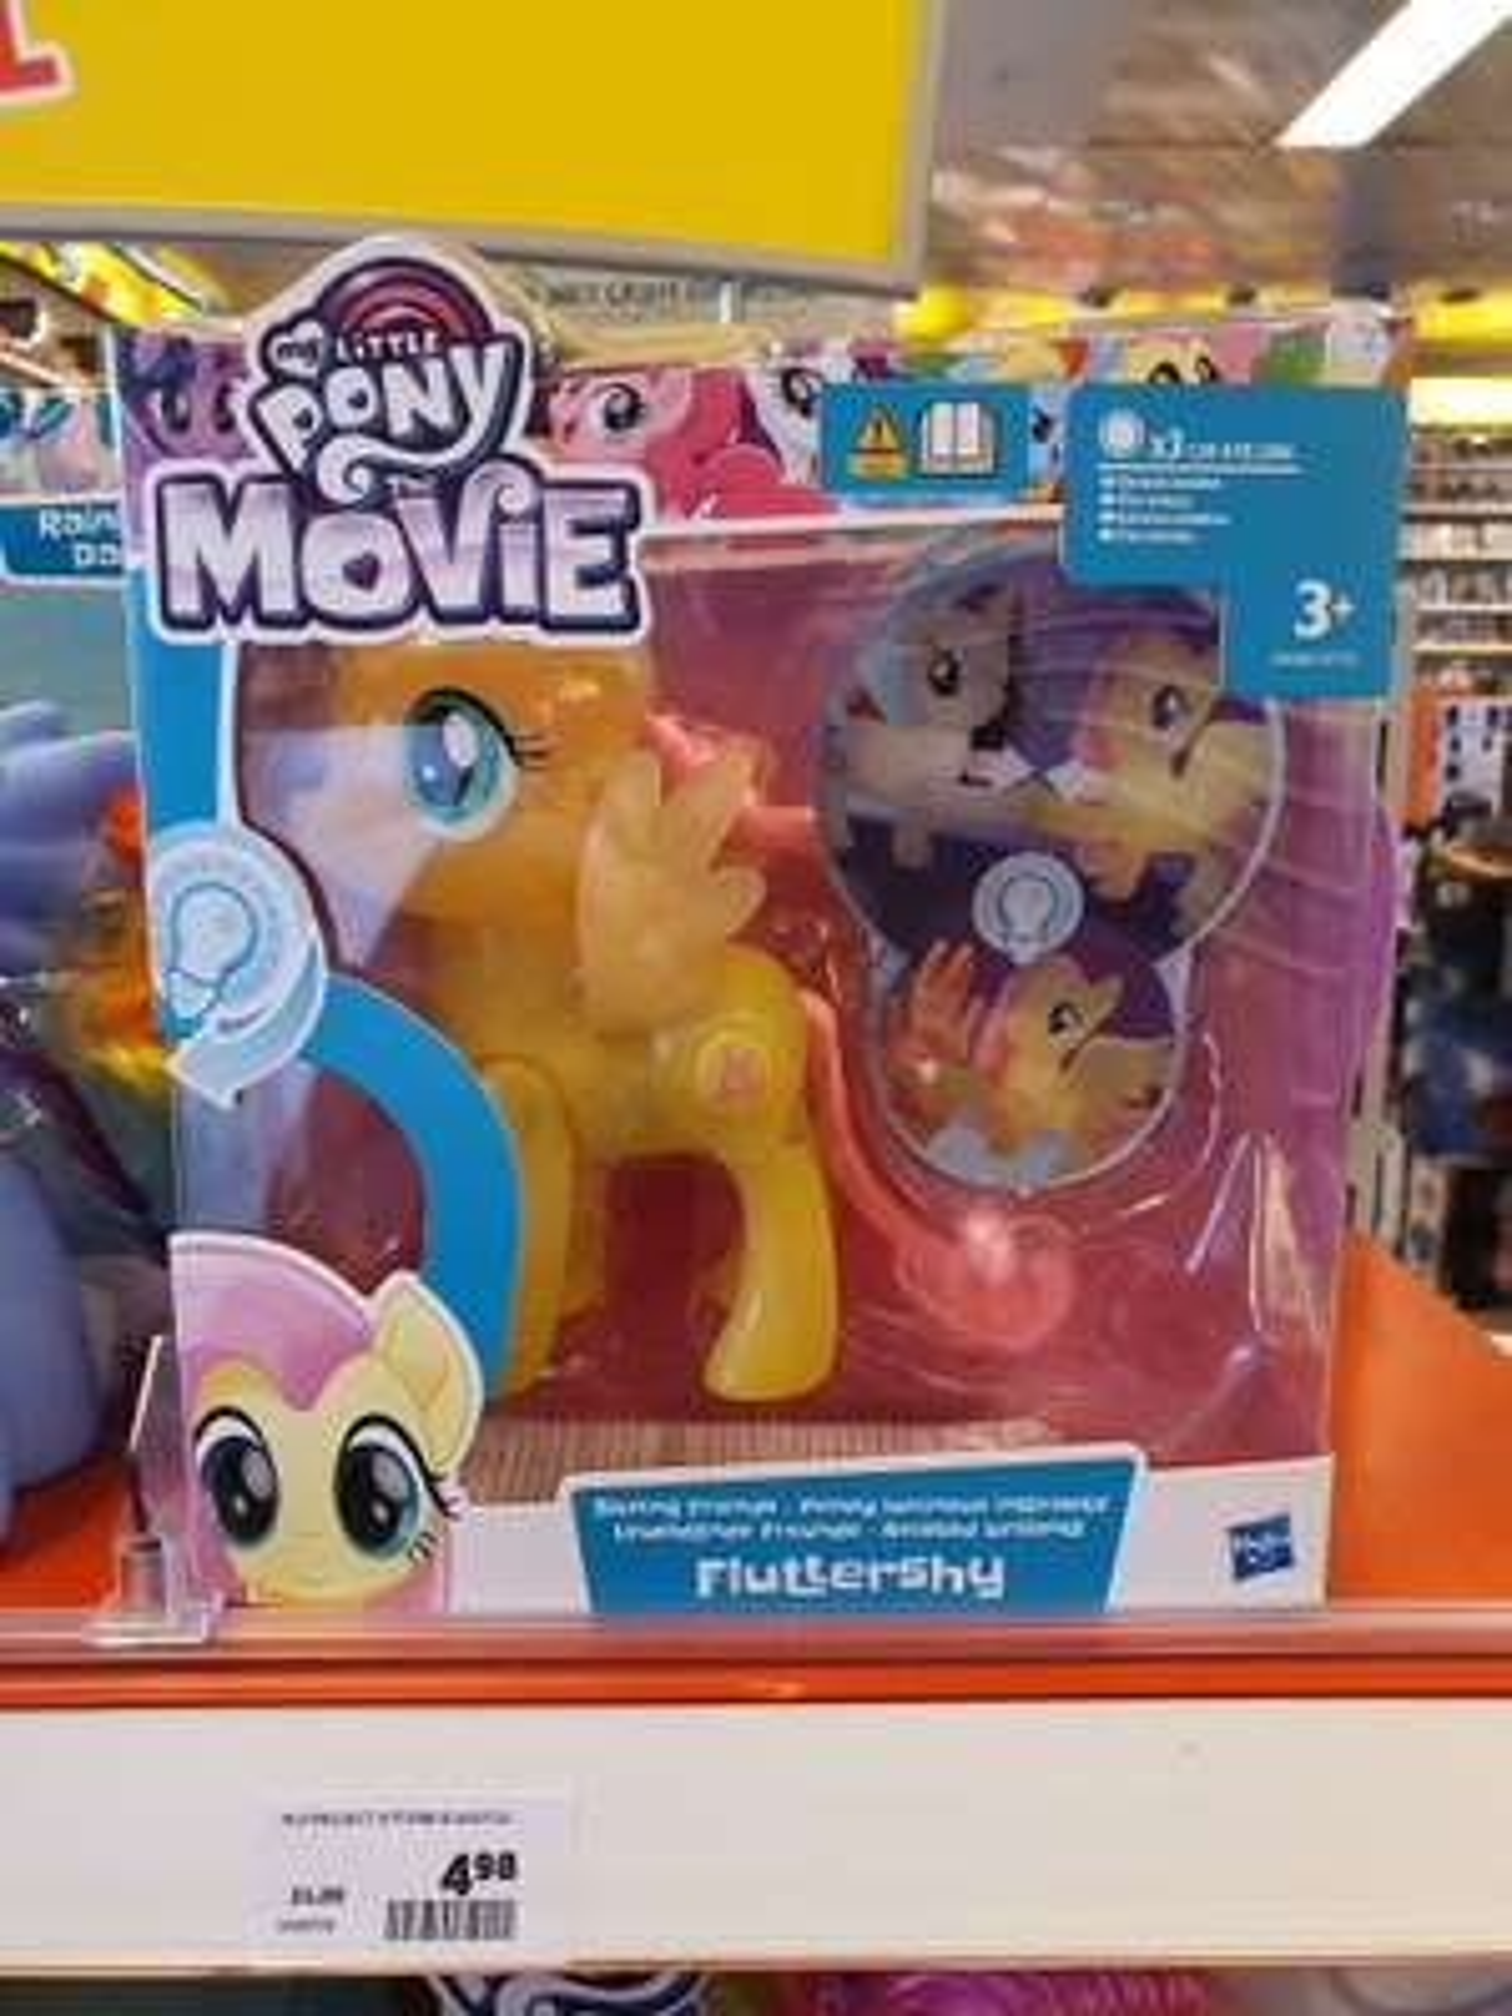 (Lokaal) Diverse My Little Pony vanaf 4.98